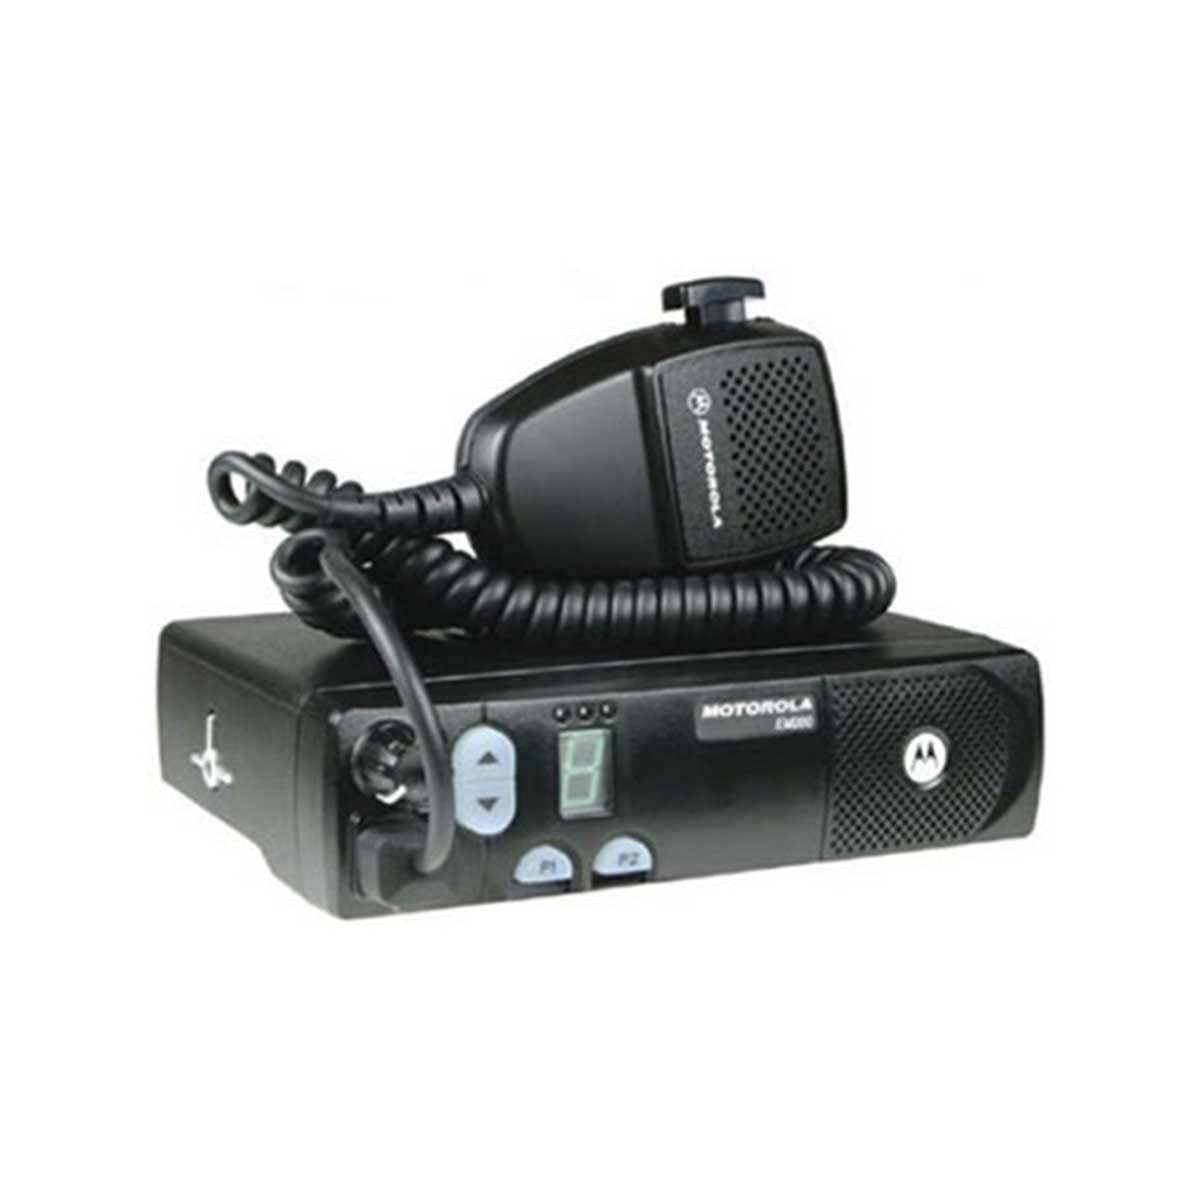 Radio Motorola EM200 Analógico LAM50QNC9AA1AN UHF 403-440 MHz